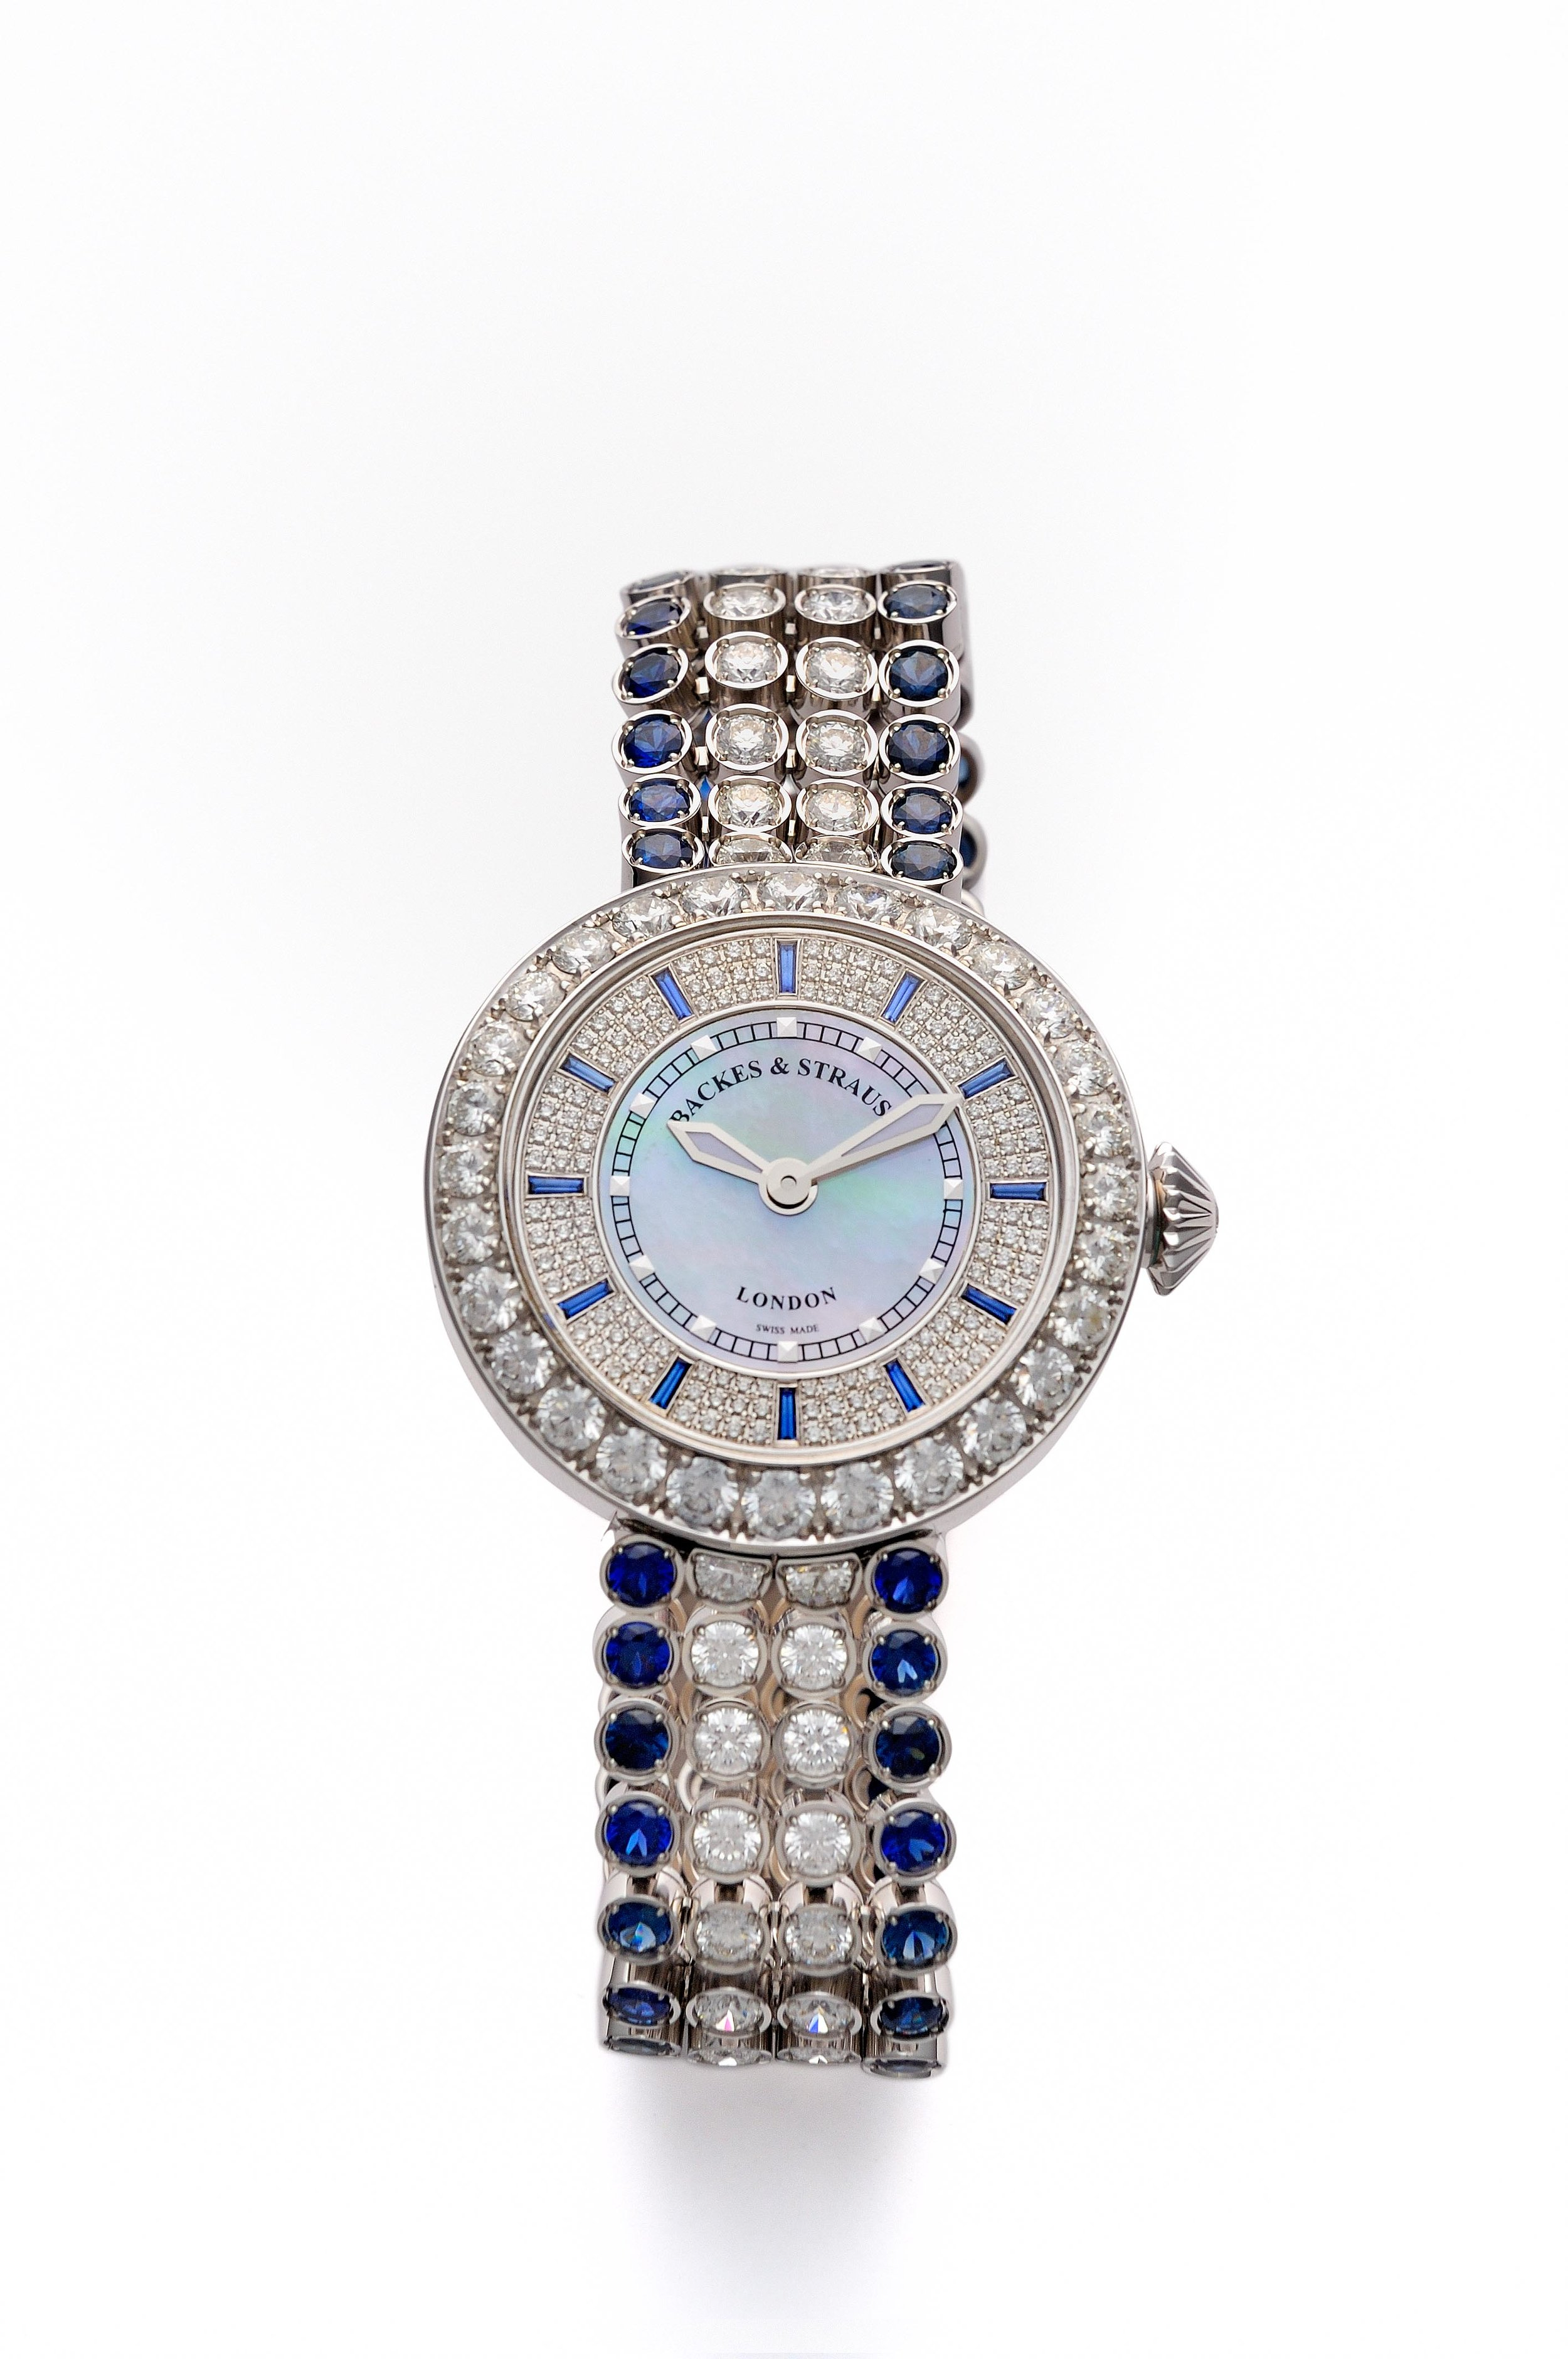 Piccadilly Princess 37 blue velvet diamond watch